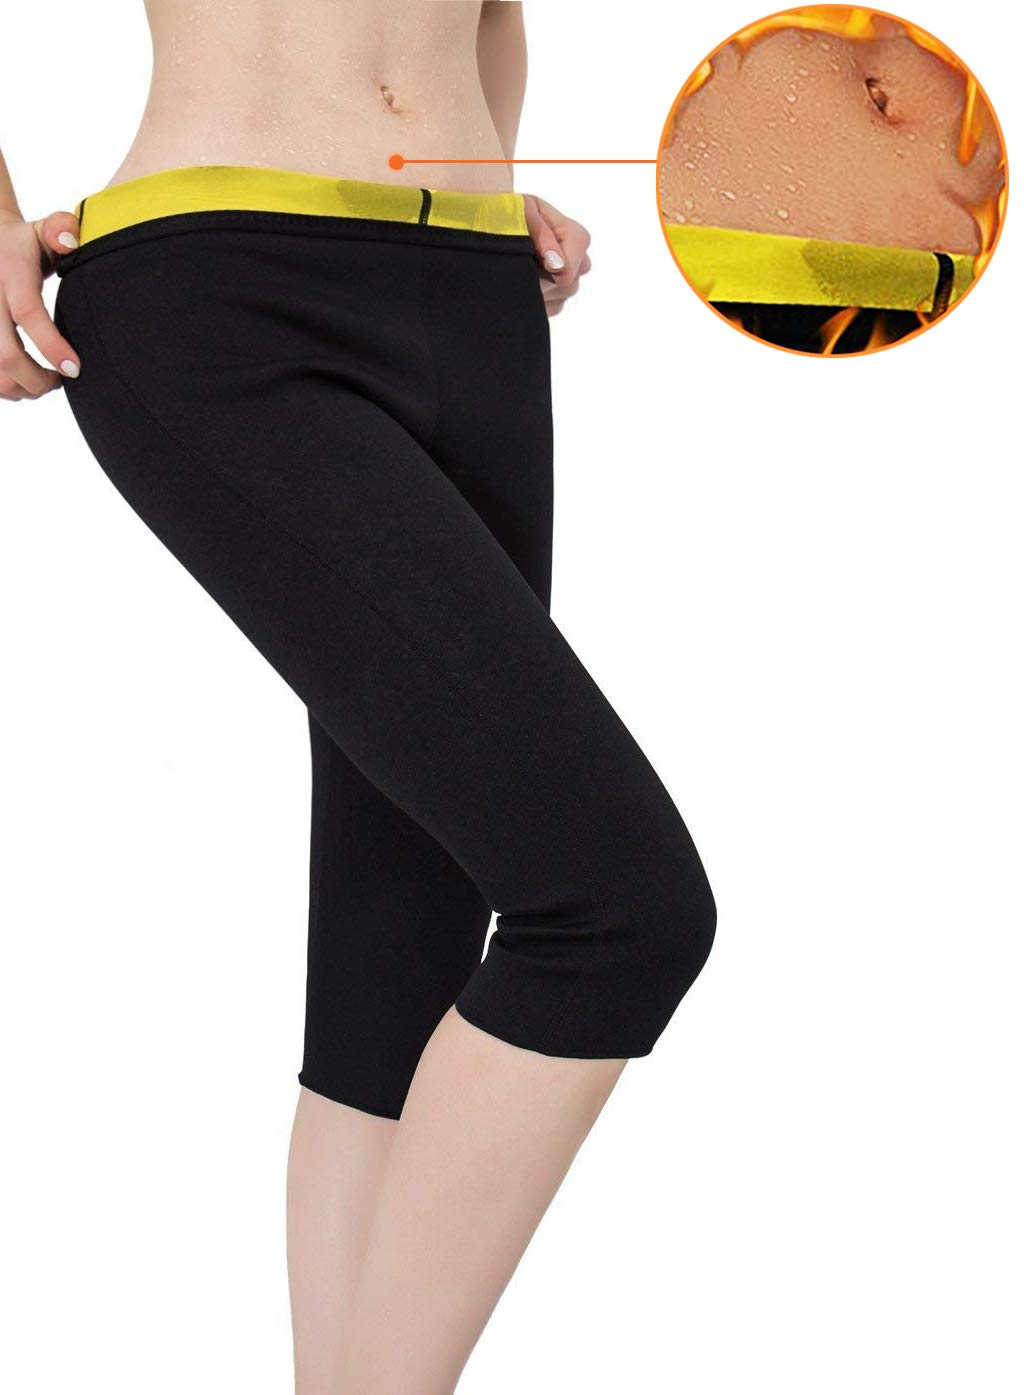 Womens Slimming Pants Neoprene for Weight Loss Hot Thermo Sweat Sauna Capris Leggings